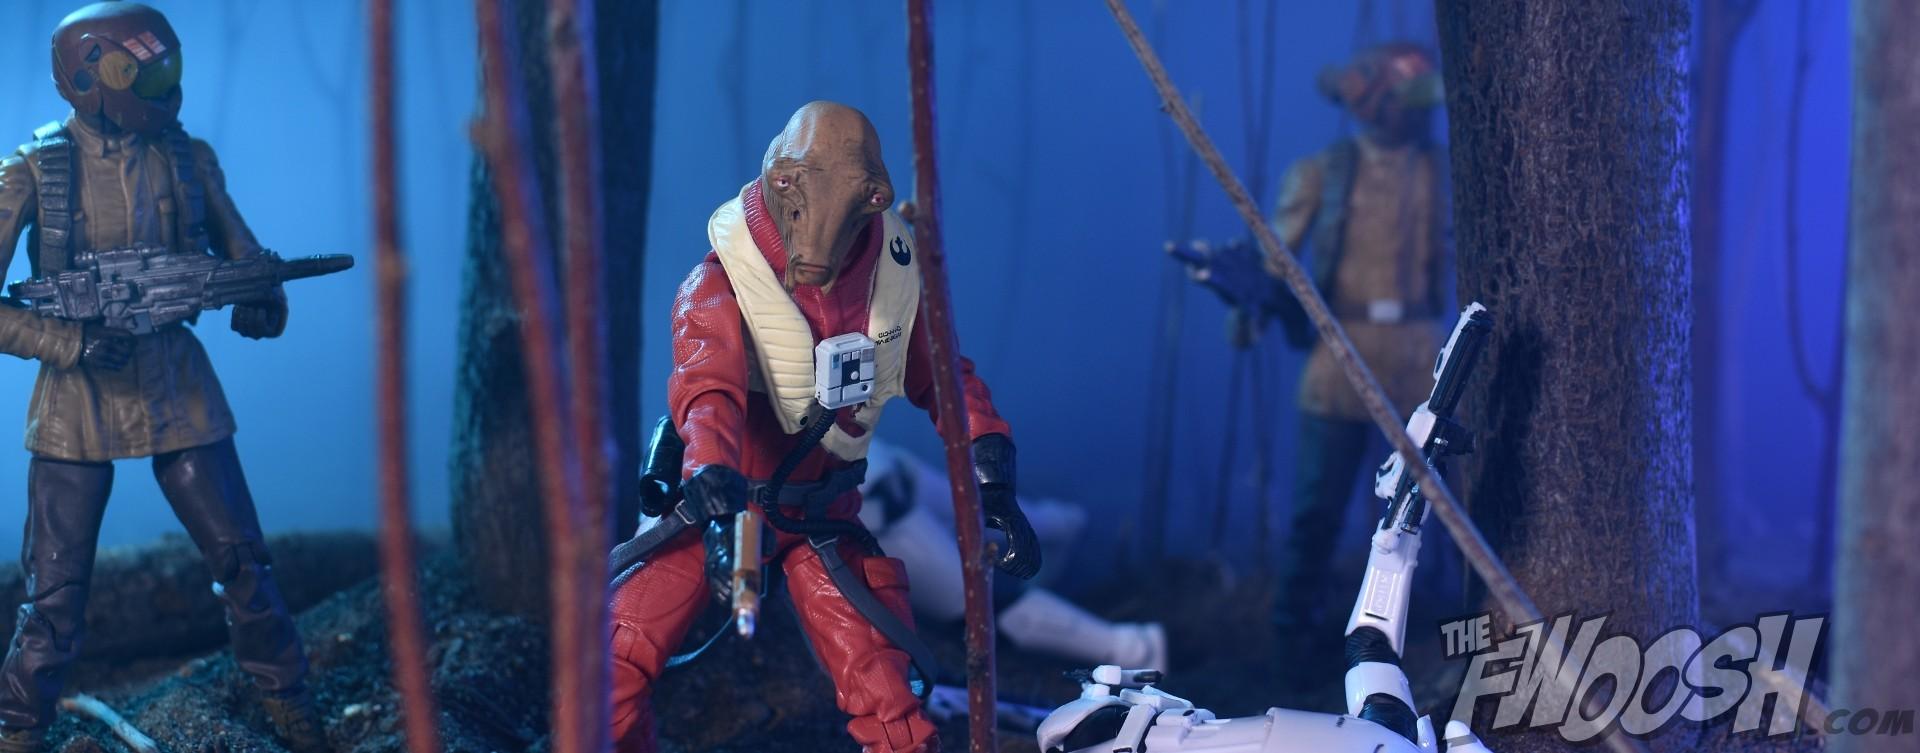 Hasbro Star Wars The Force Awakens Black Series Ello Asty Fwoosh Top 20 21